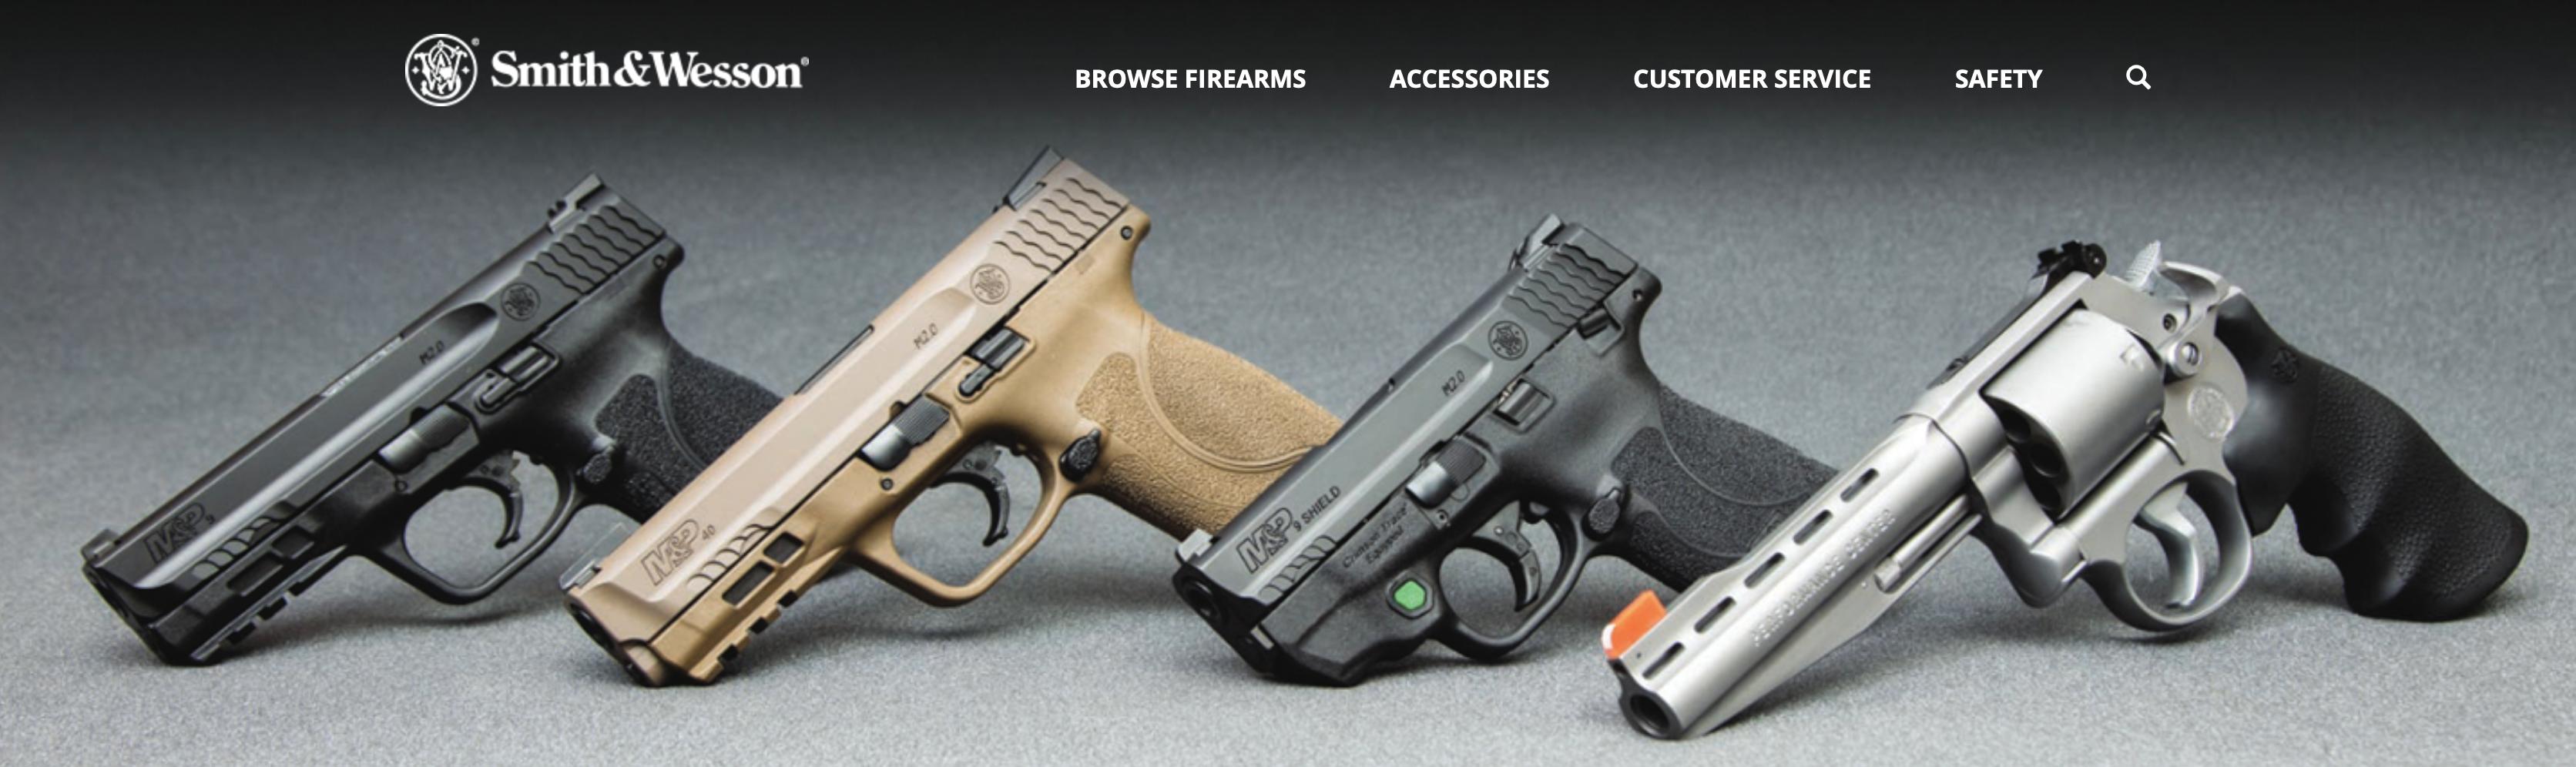 https://www.precisionarsenal.com/catalog/handguns/semi-automatic-handguns?brand_id=678&page=1